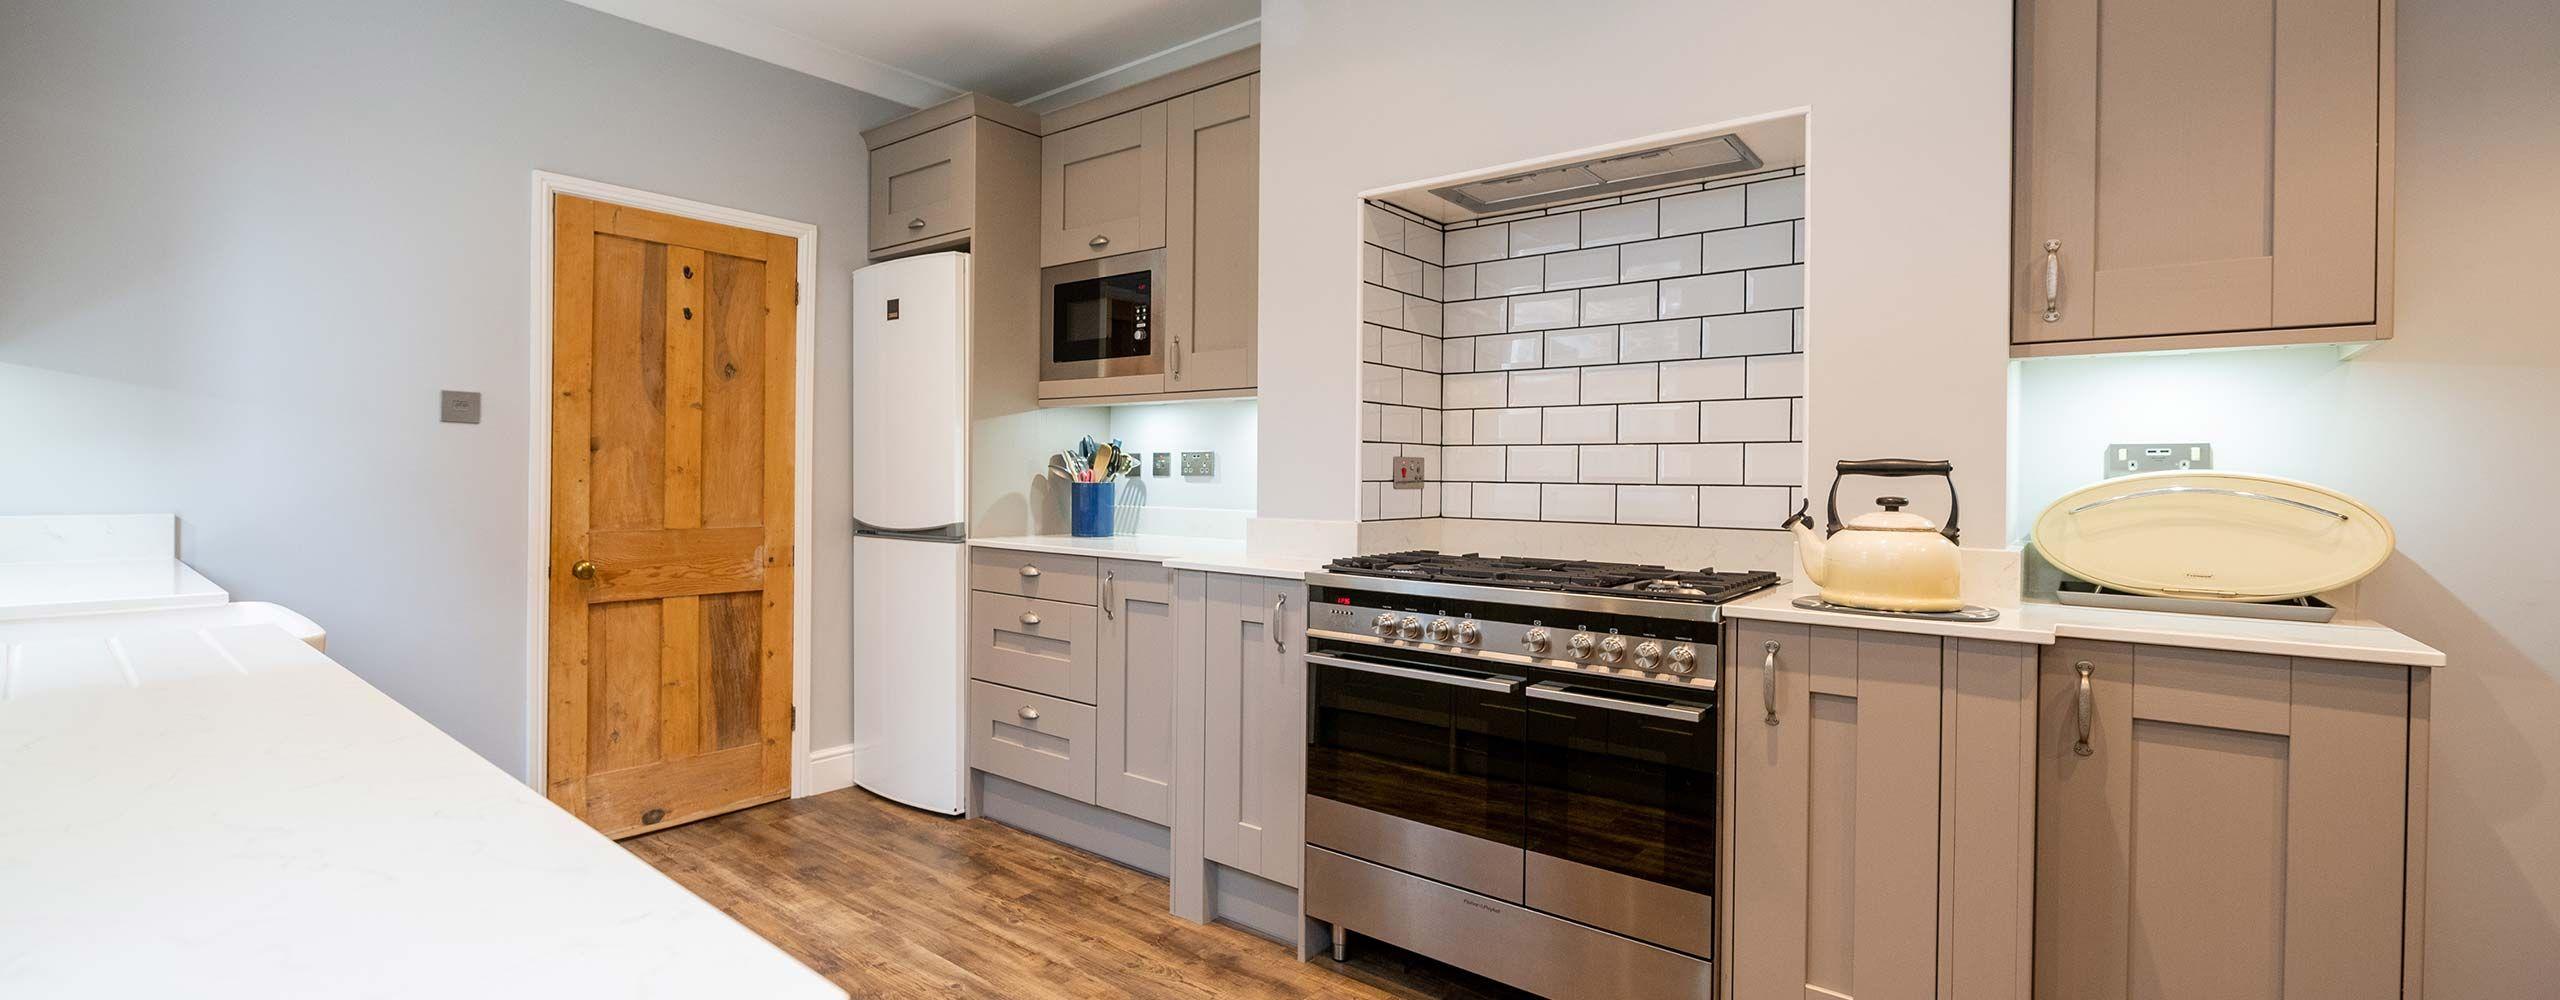 Kitchen design norwich kitchen design centre classic